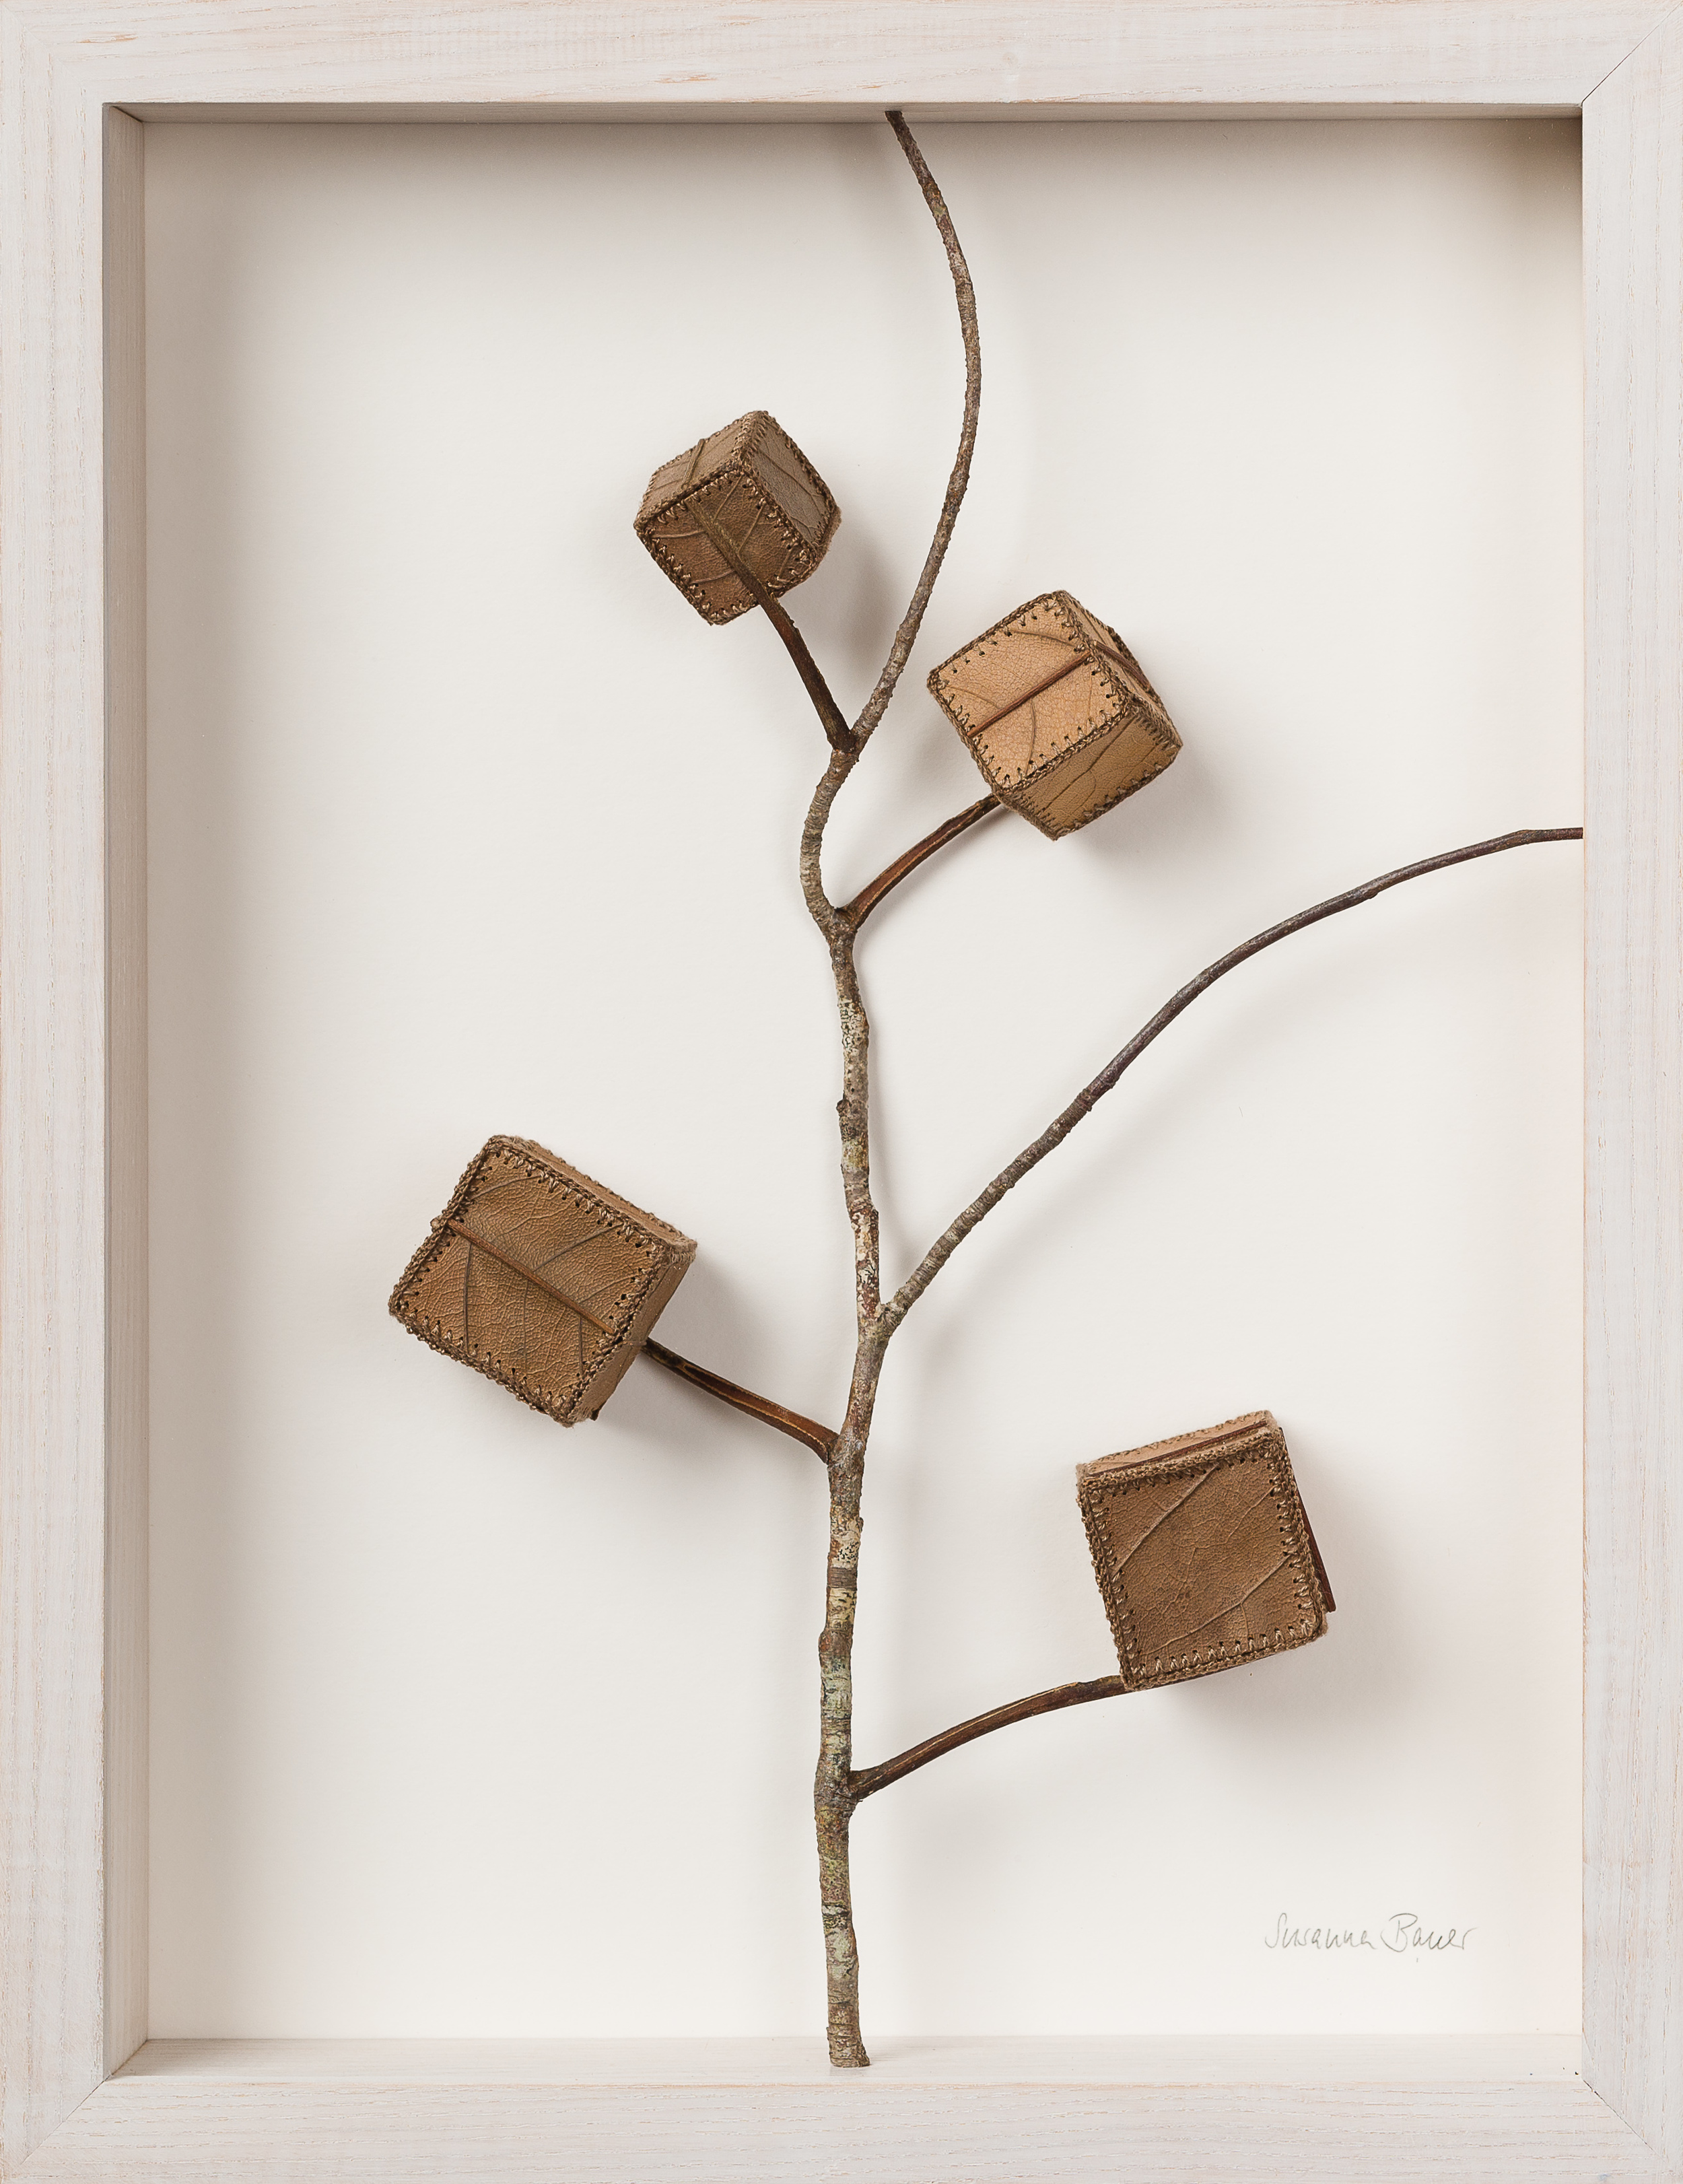 Cube Tree No.4   34.2 H x 26.5 x cm  magnolia leaves, cotton yarn, wood  £ 900